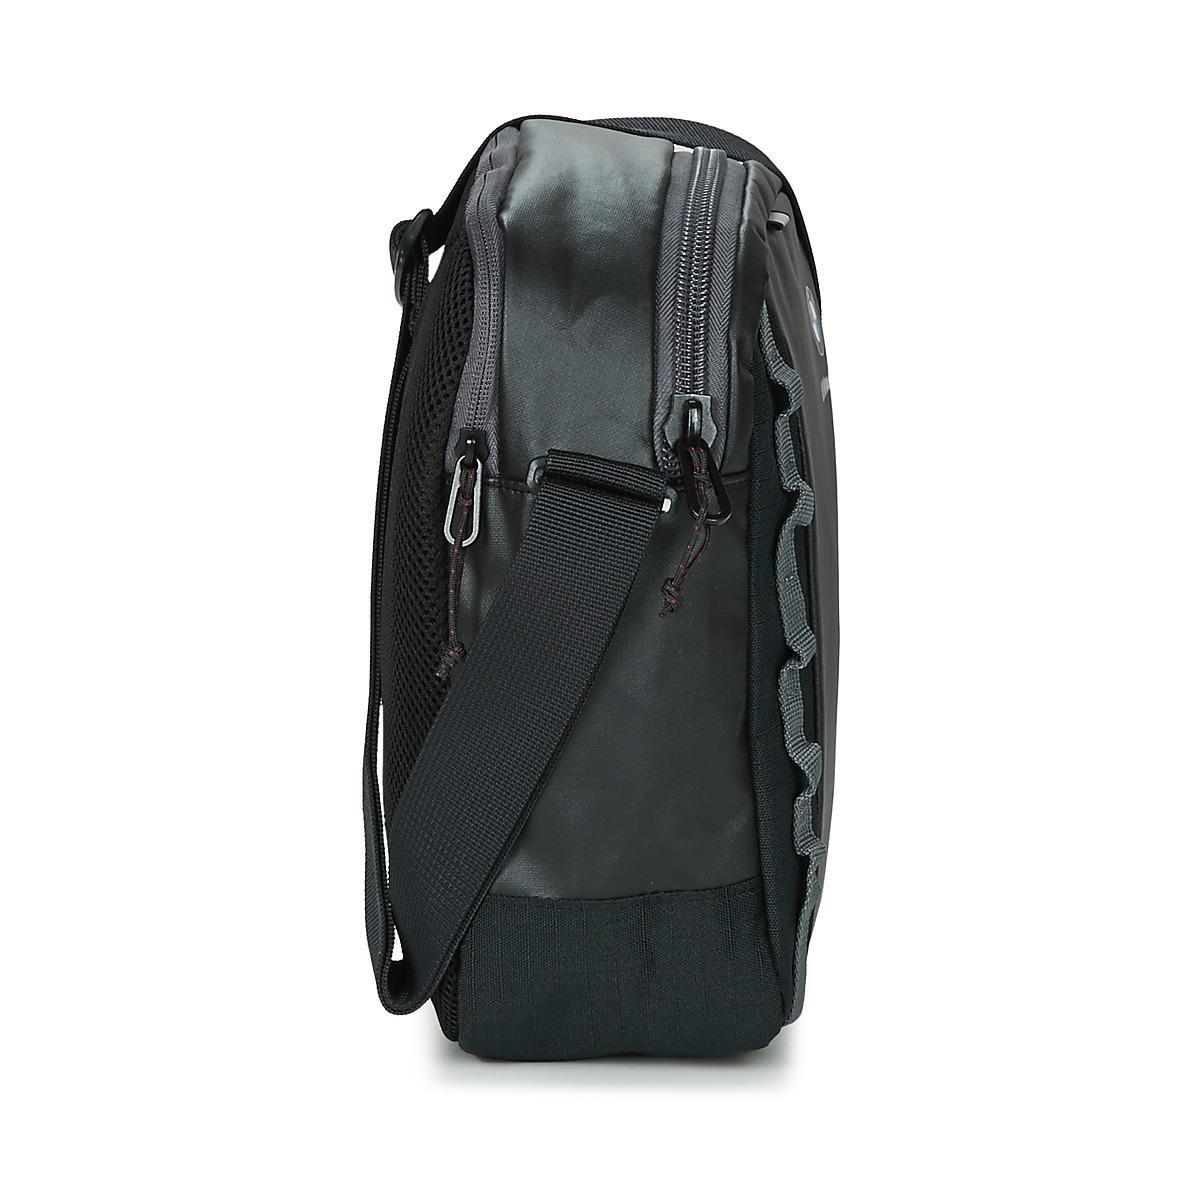 PUMA Bmw M Msp Portable Men s Pouch In Black in Black for Men - Lyst 43efe77f42657